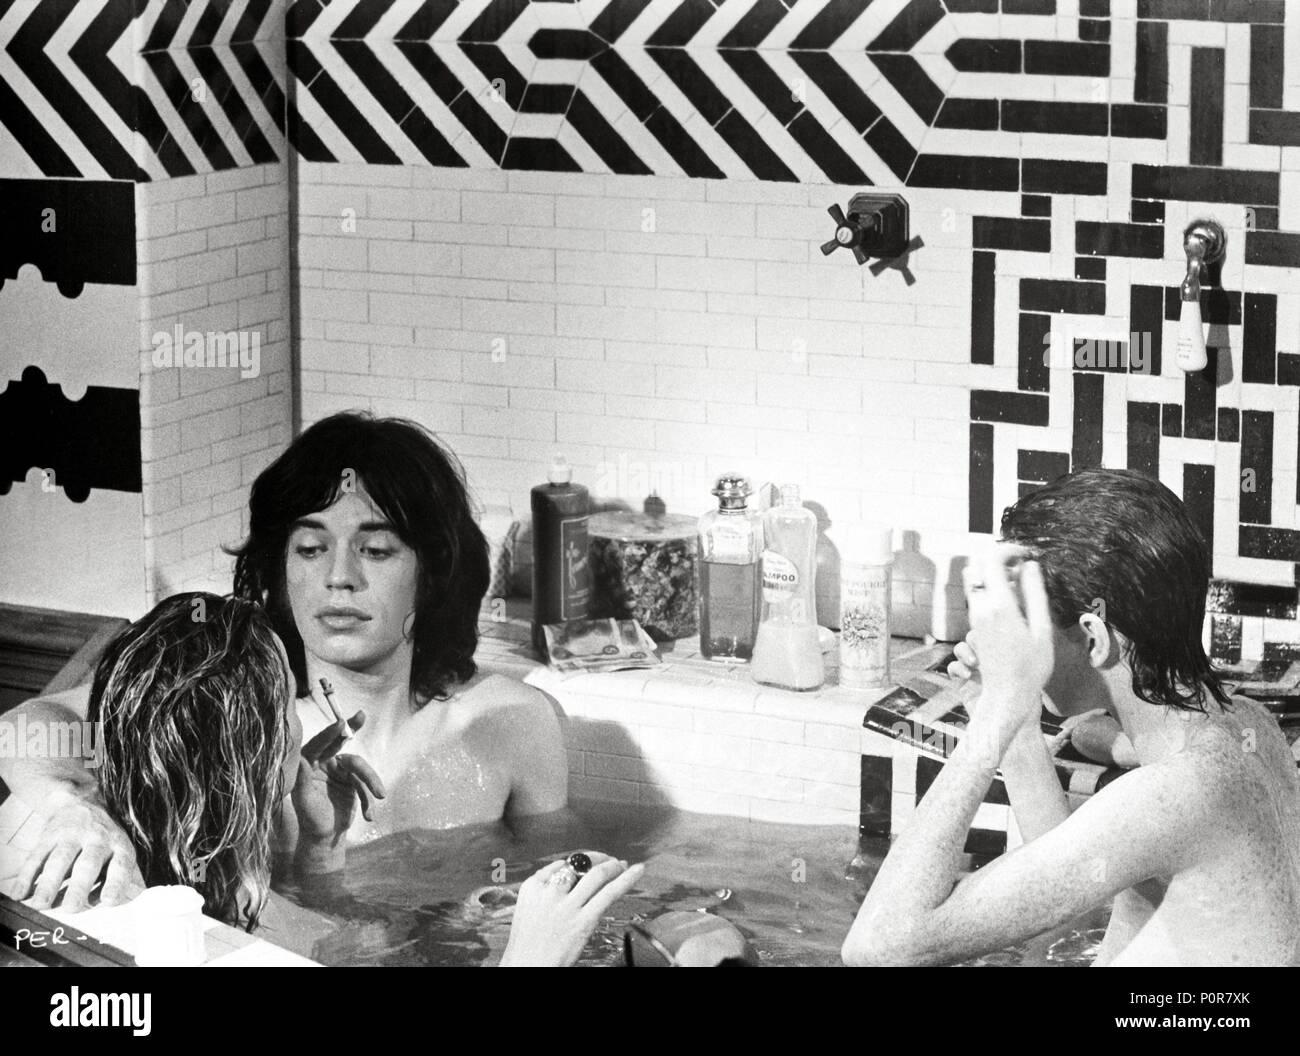 Original Film Title: PERFORMANCE.  English Title: PERFORMANCE.  Film Director: NICOLAS ROEG; DONALD CAMMELL.  Year: 1970.  Stars: MICK JAGGER. Credit: WARNER/GOODTIMES / Album - Stock Image